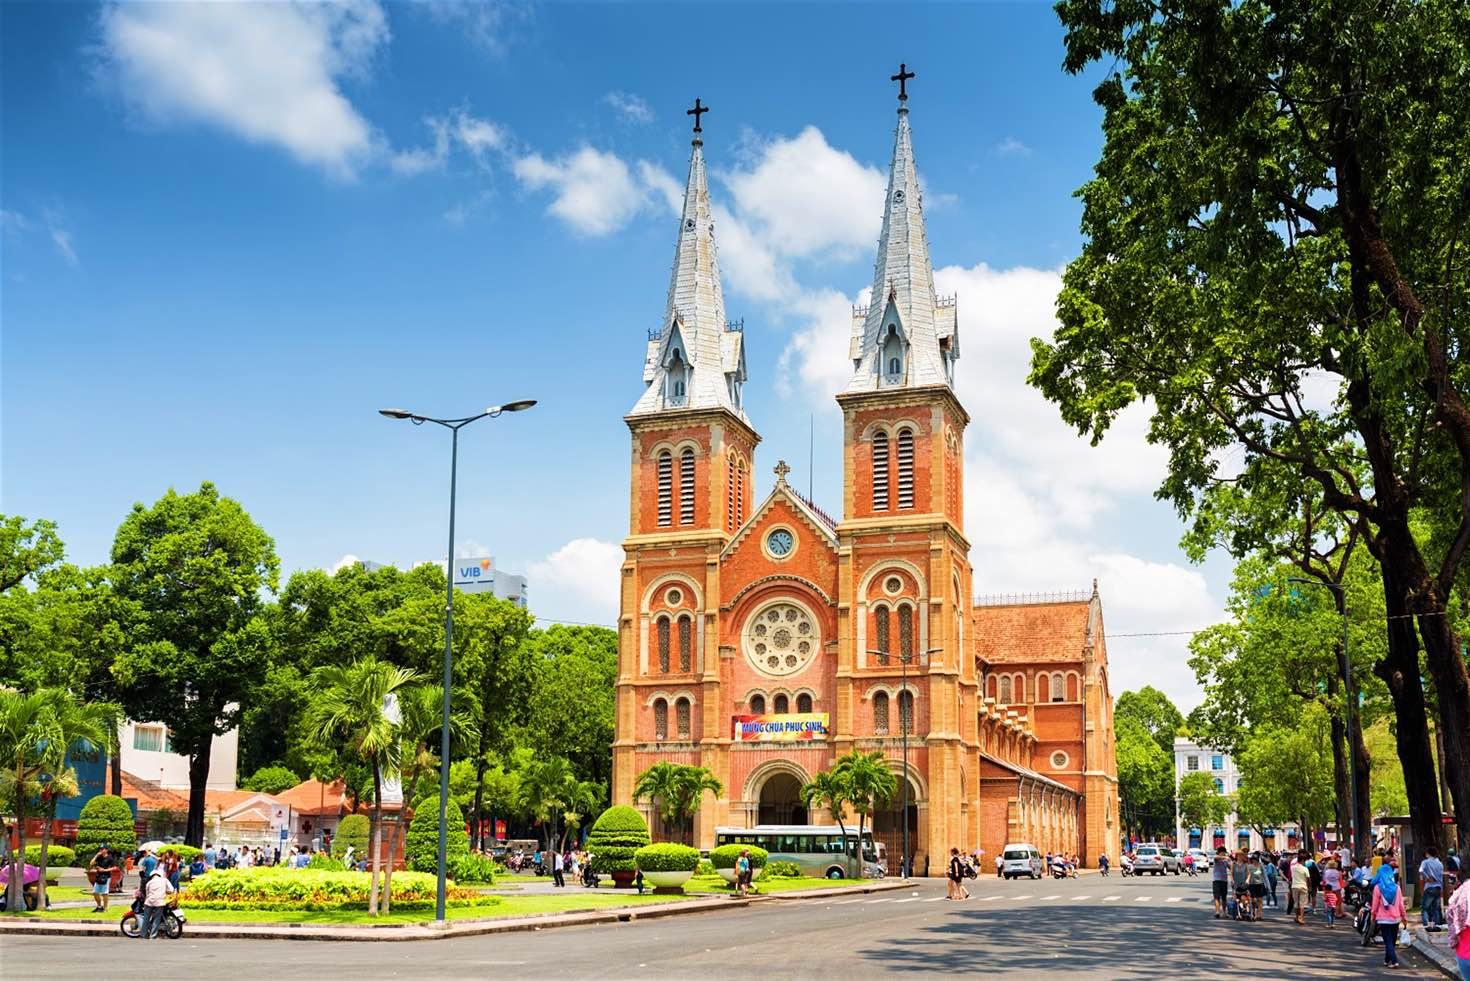 کلیسای نوتردام هوشی مینه ویتنام